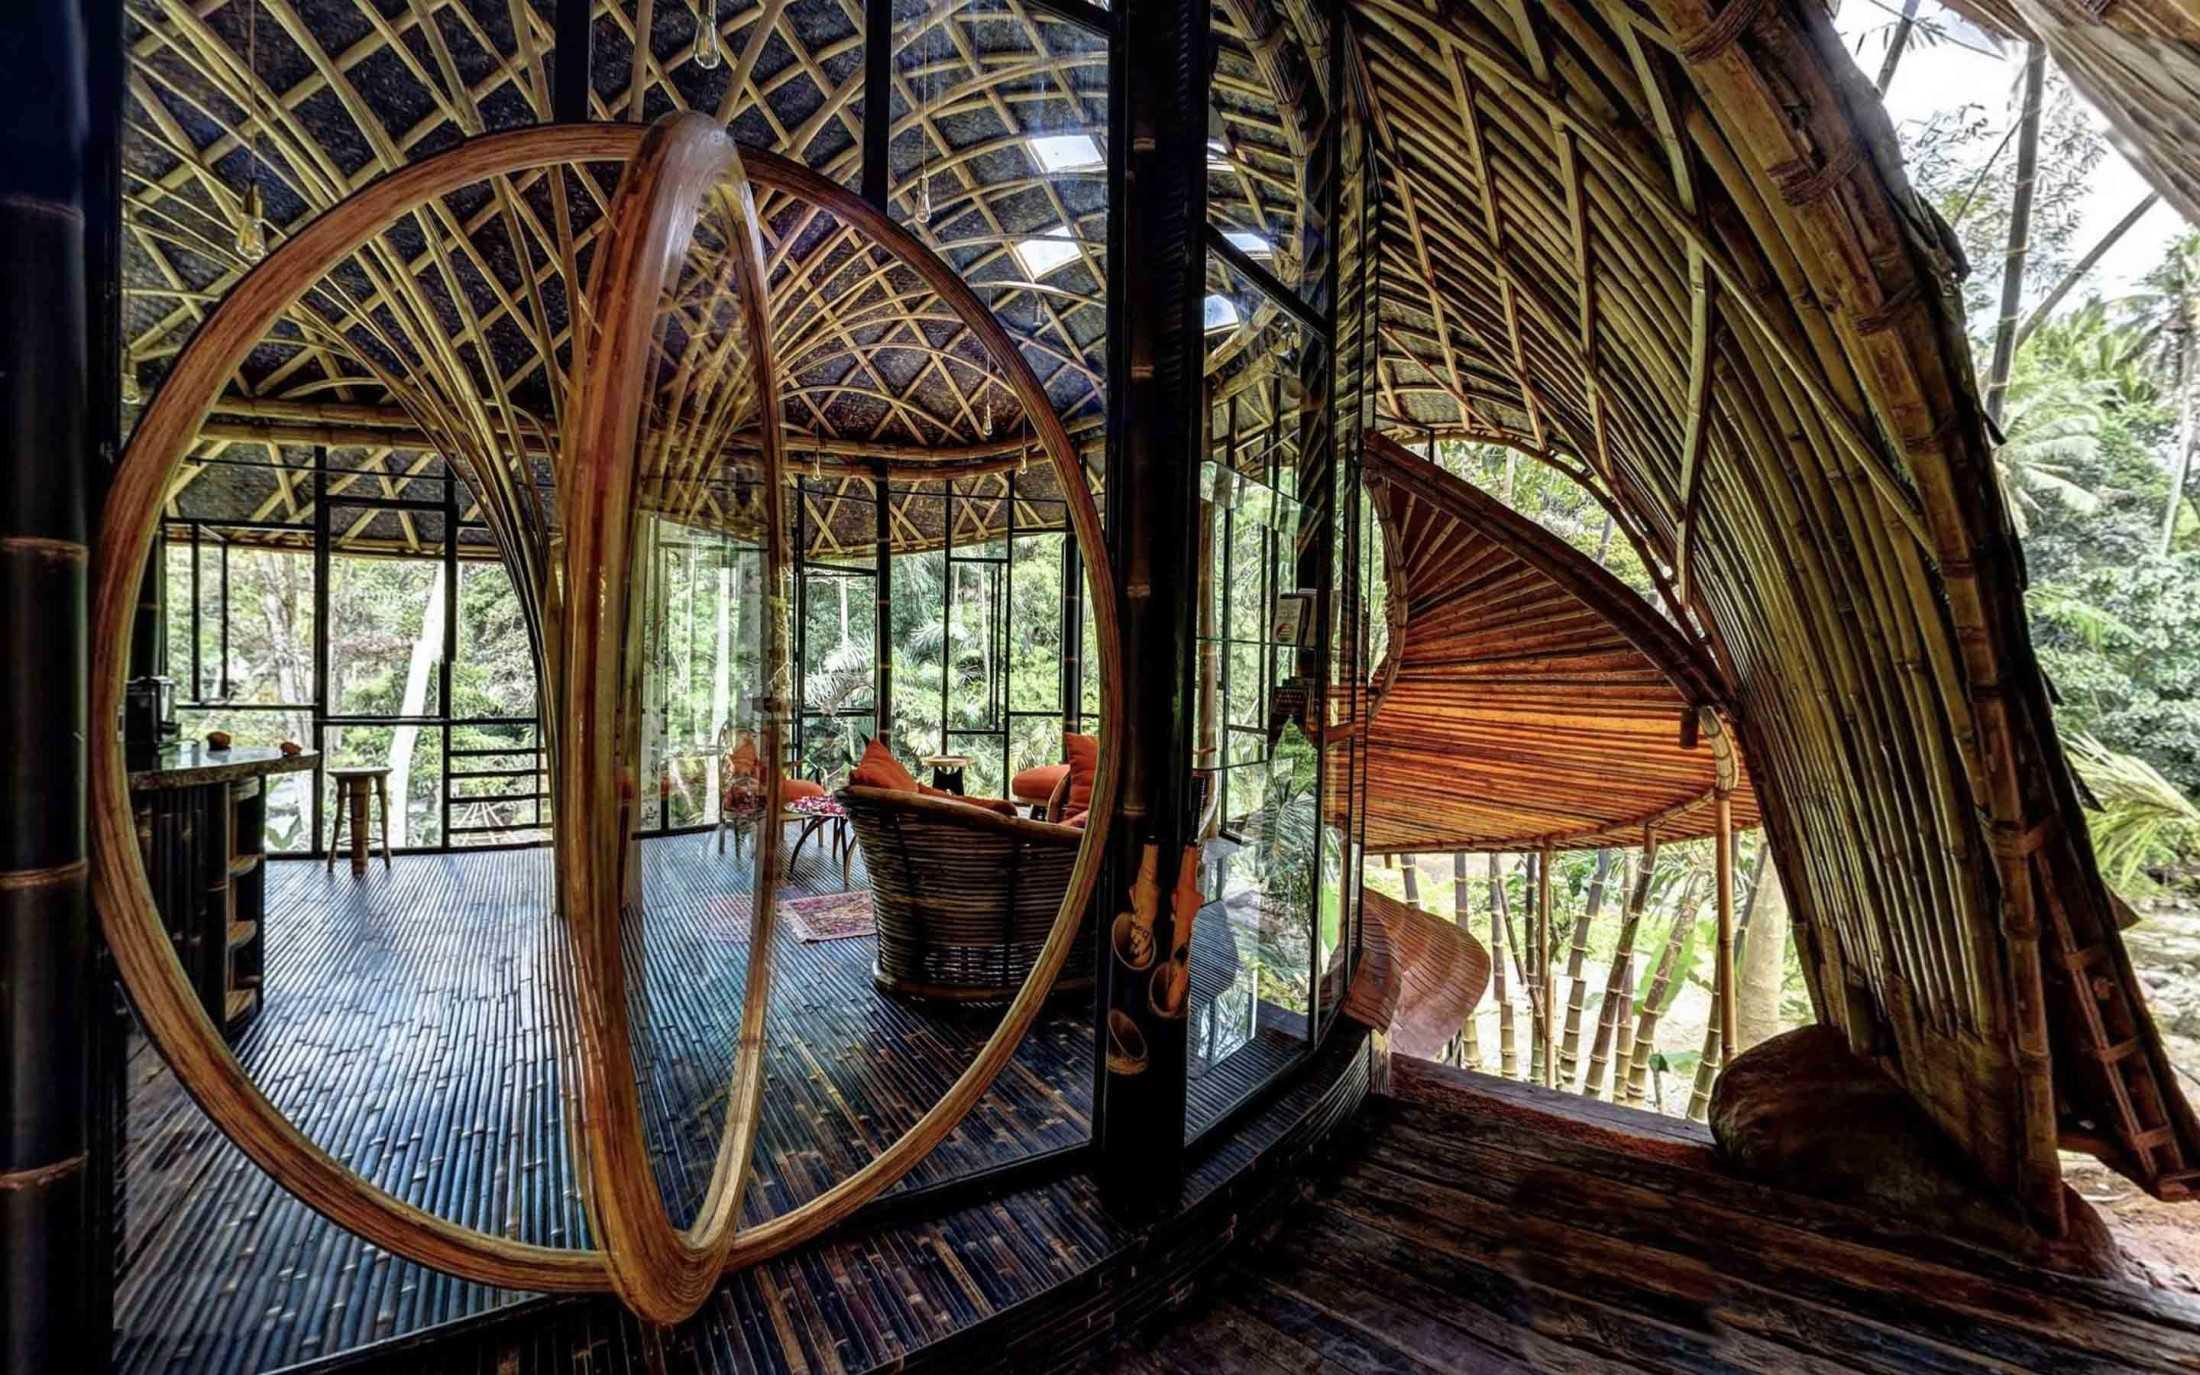 Agung Budi Raharsa | Architecture & Engineering Riverbend Bamboo House - Bali Bali, Indonesia Bali, Indonesia Interior View Tropical 88708